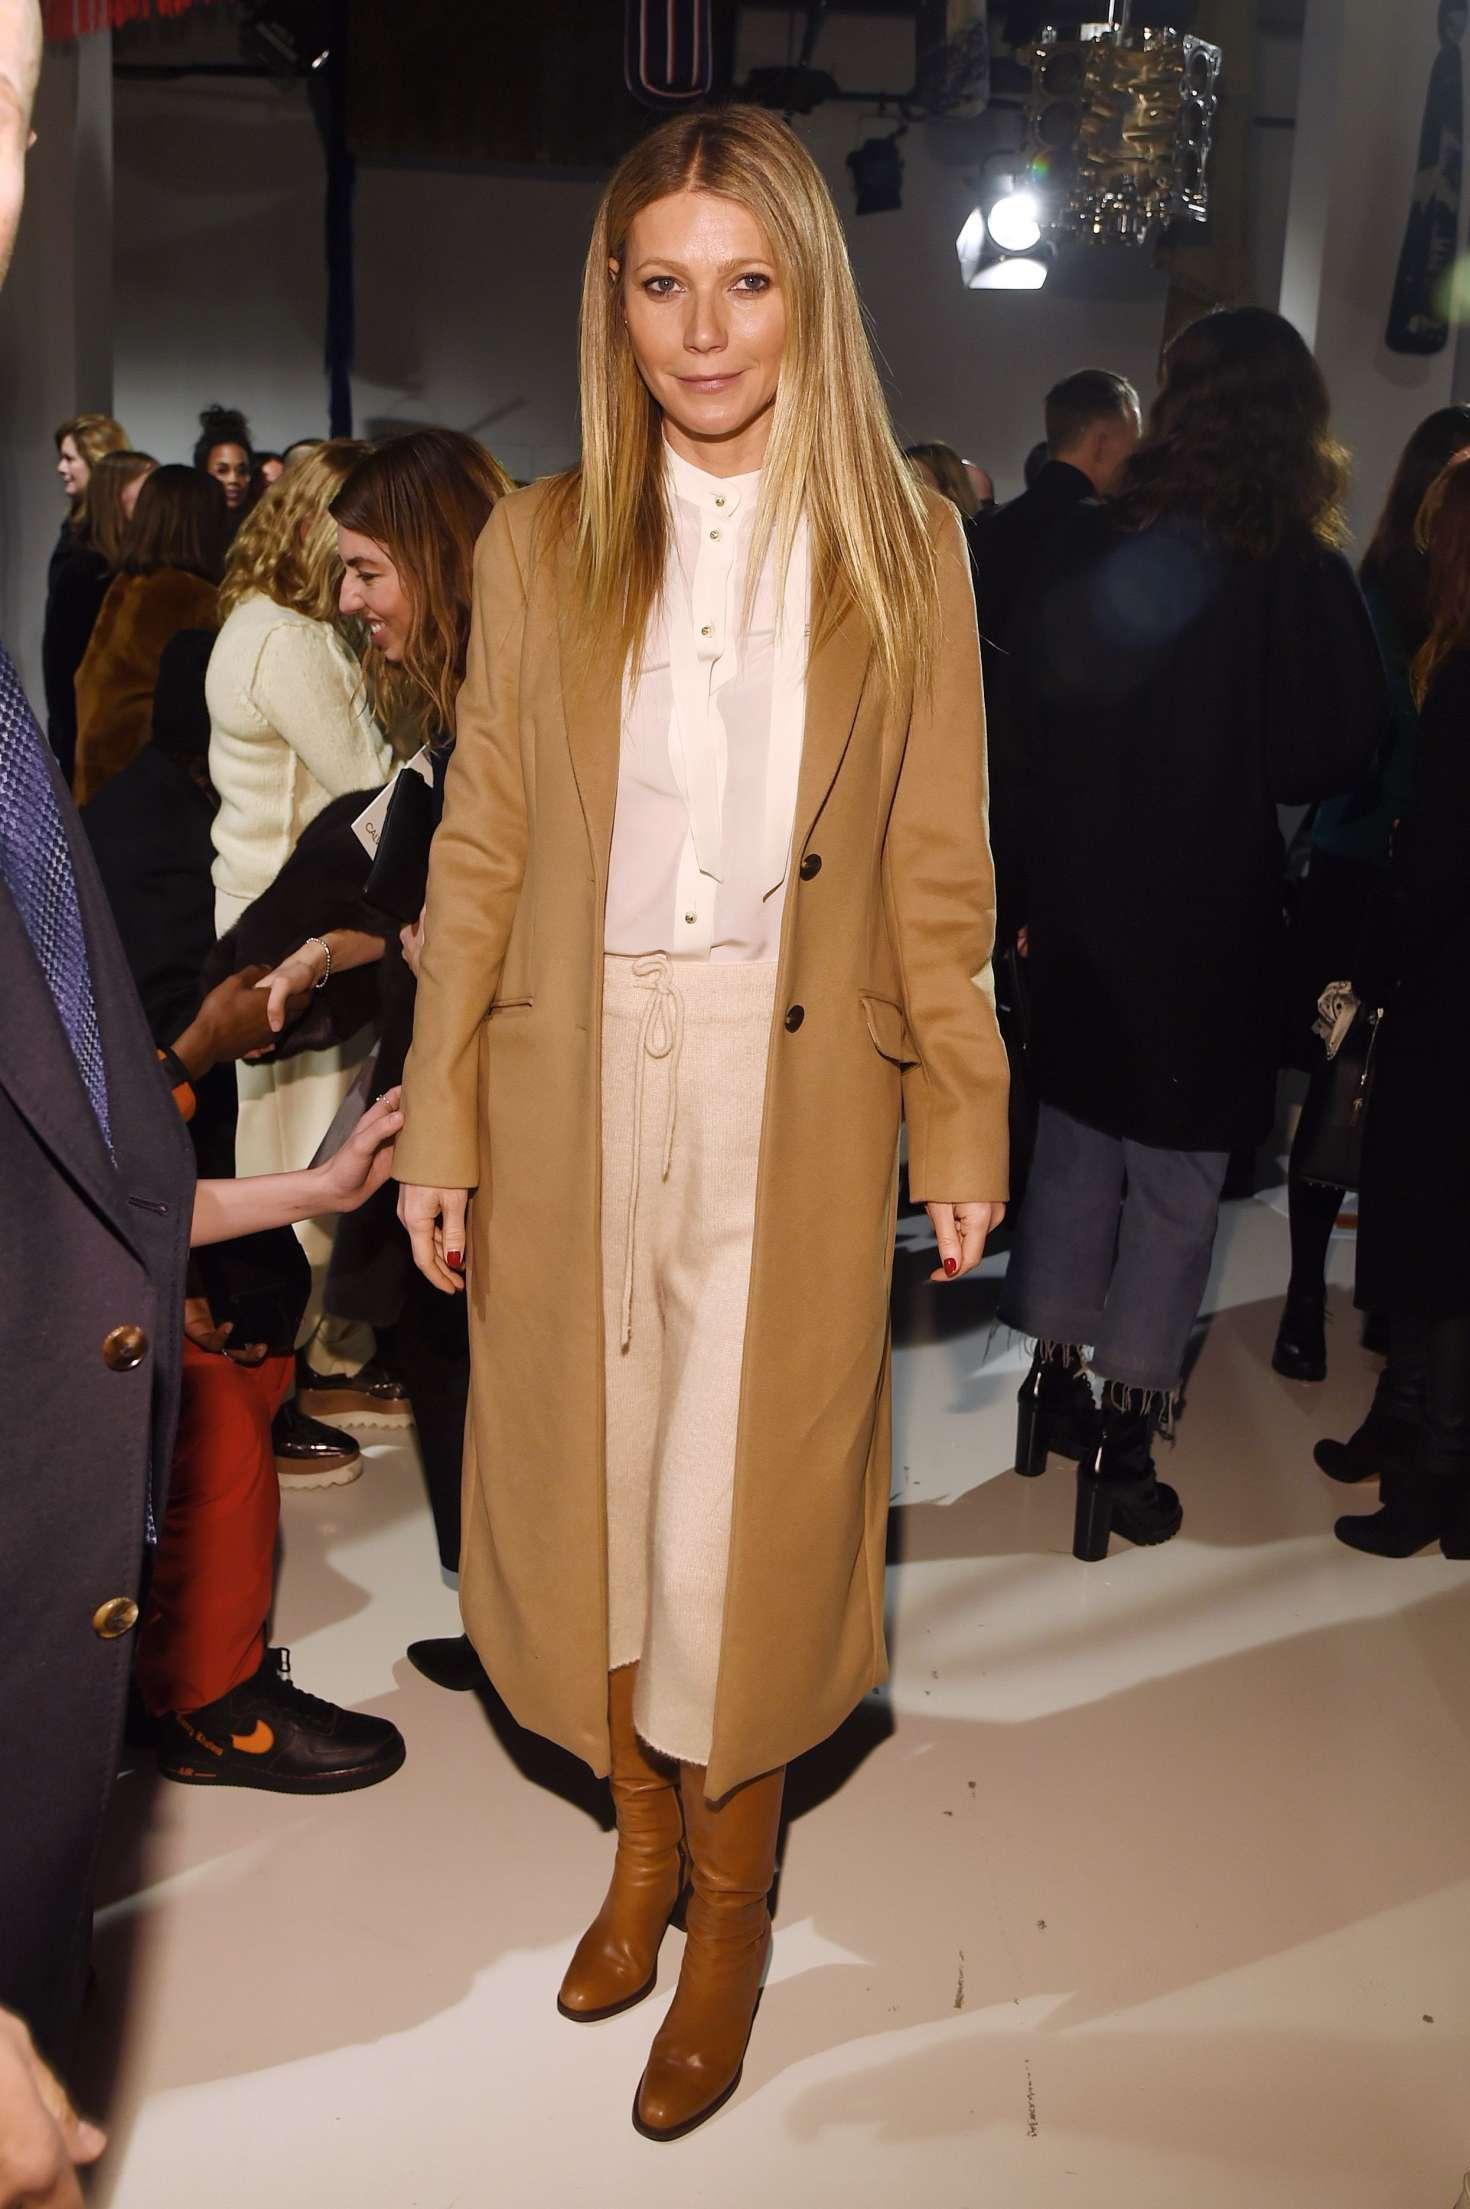 Gwyneth Paltrow: Calvin Klein Show 2017 at NYFW -06